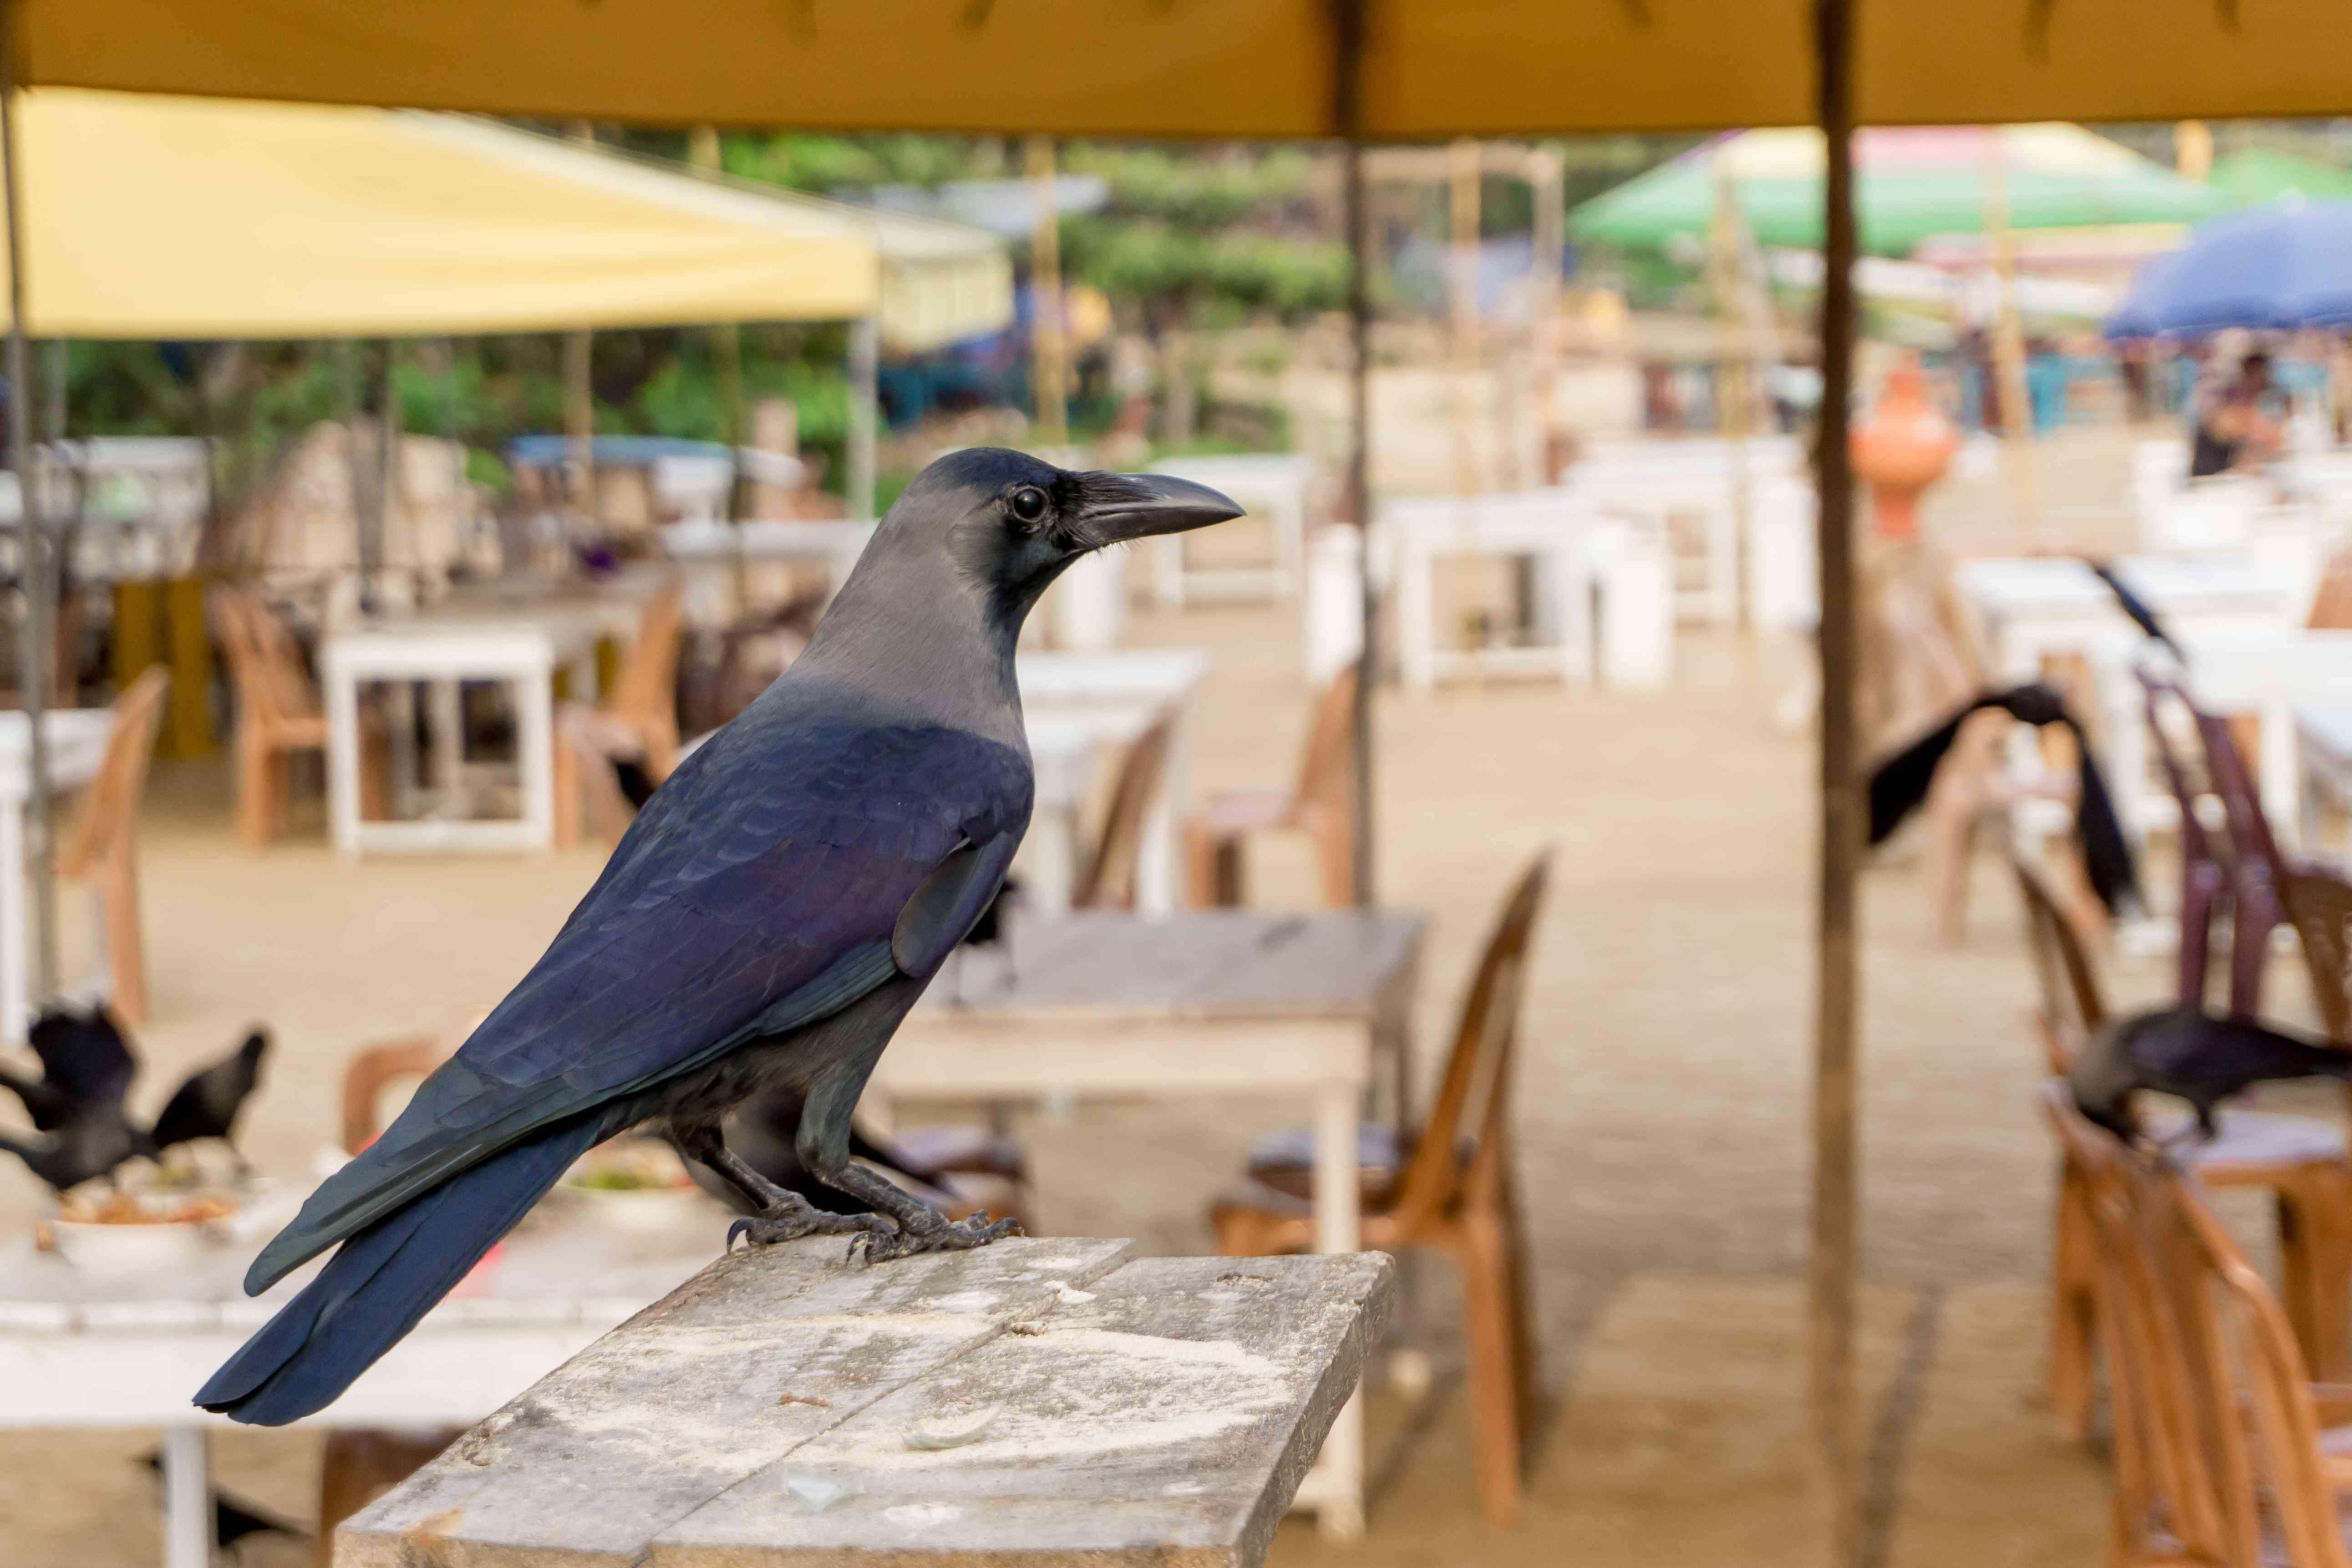 hooded crow surveys a restaurant patio for food